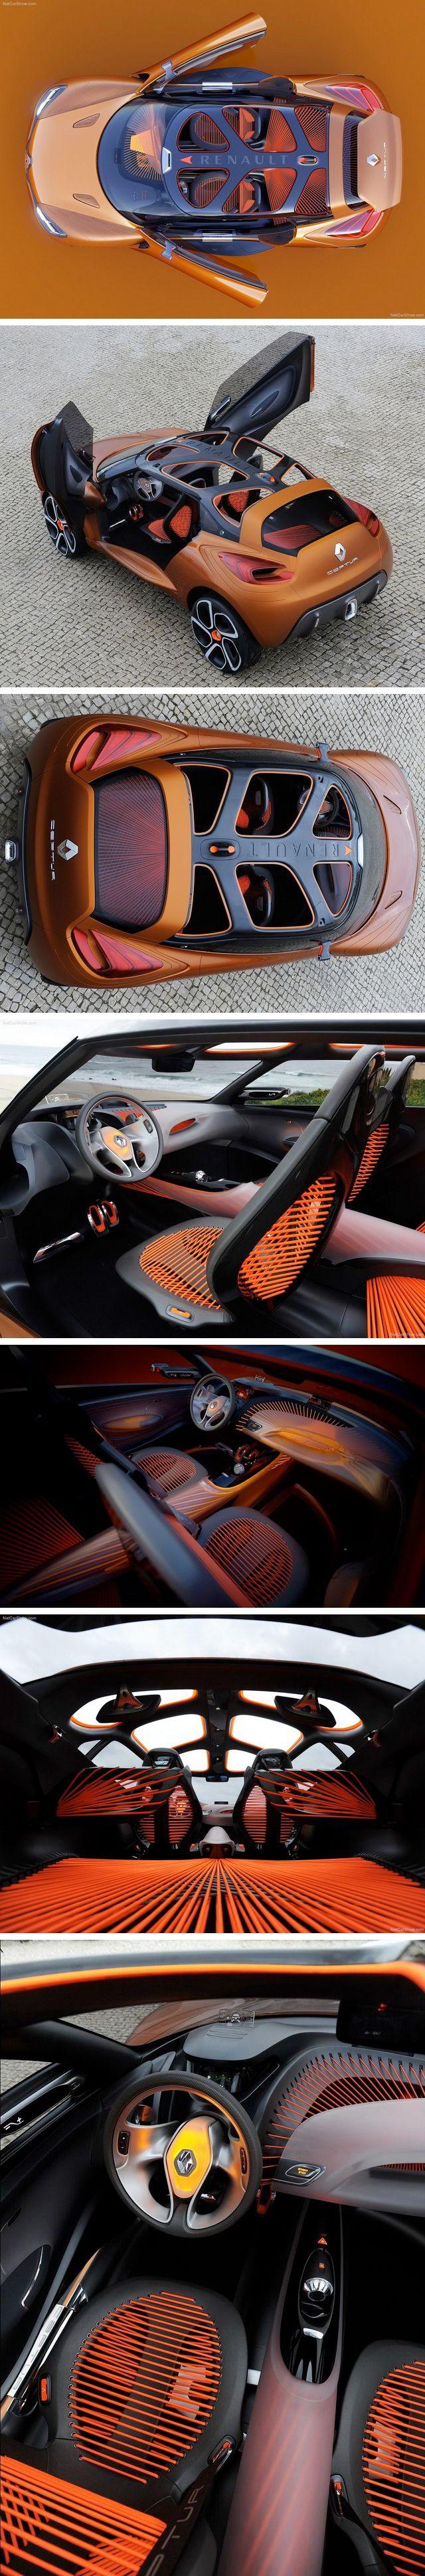 ♂ Renault Captur Concept (2011) From http://www.conceptcar.ee/